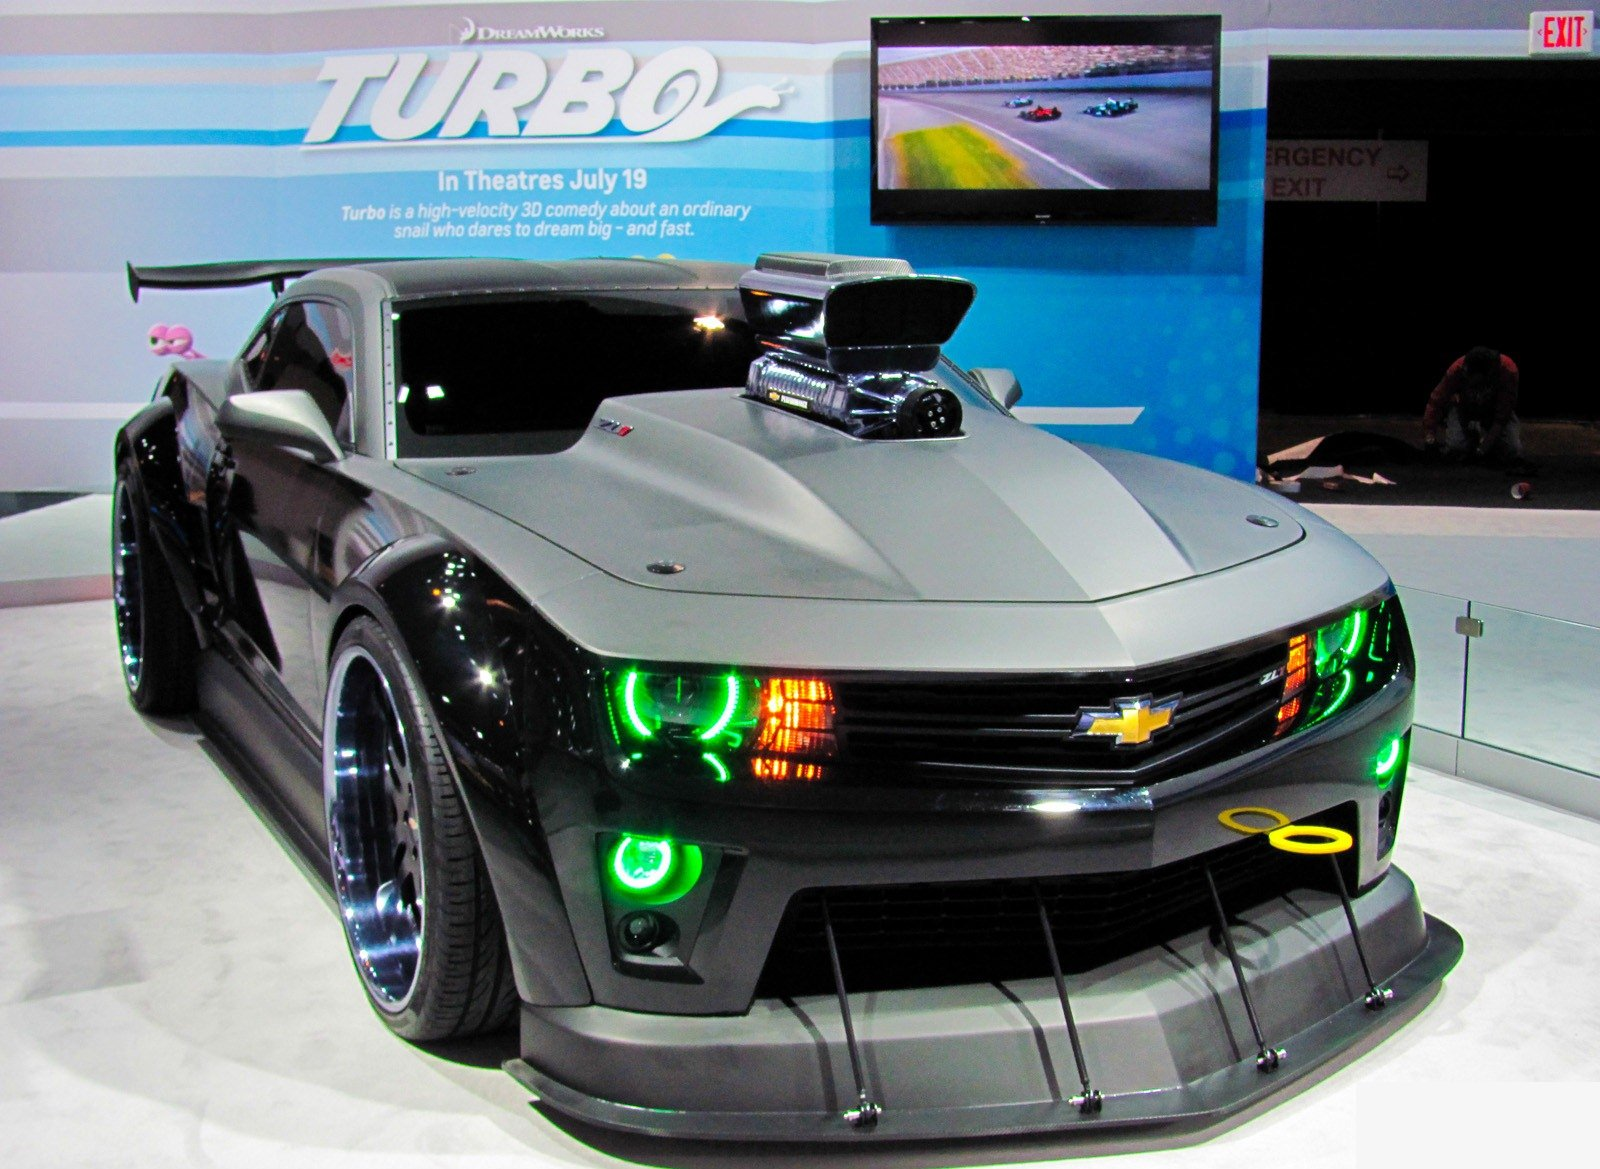 Chevrolet Camaro Overdone for 'Turbo' The Movie